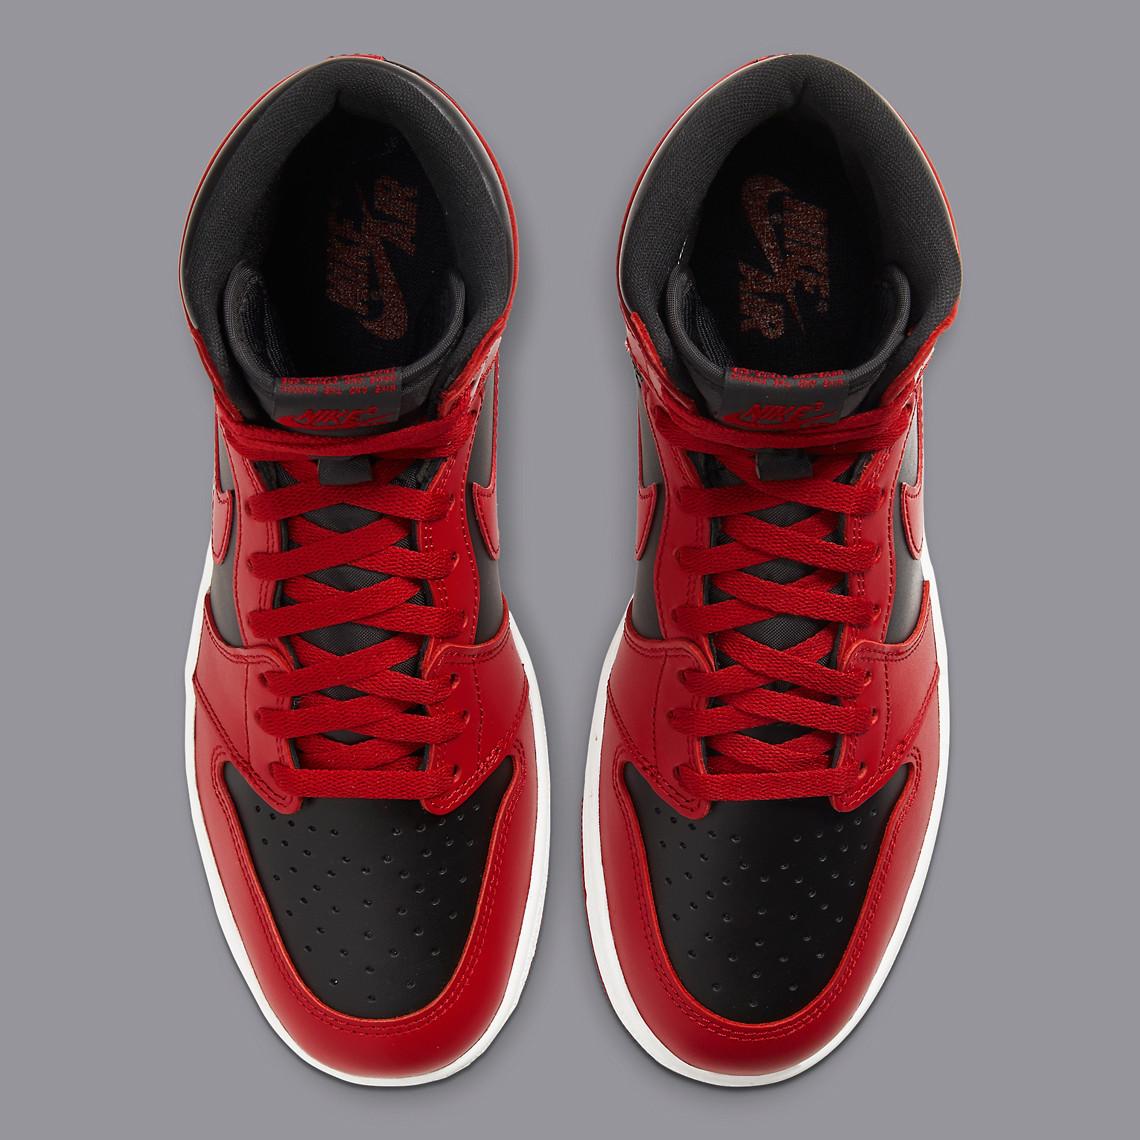 Air Jordan 1 High '85 ''Varsity Red'' - BQ4422-600